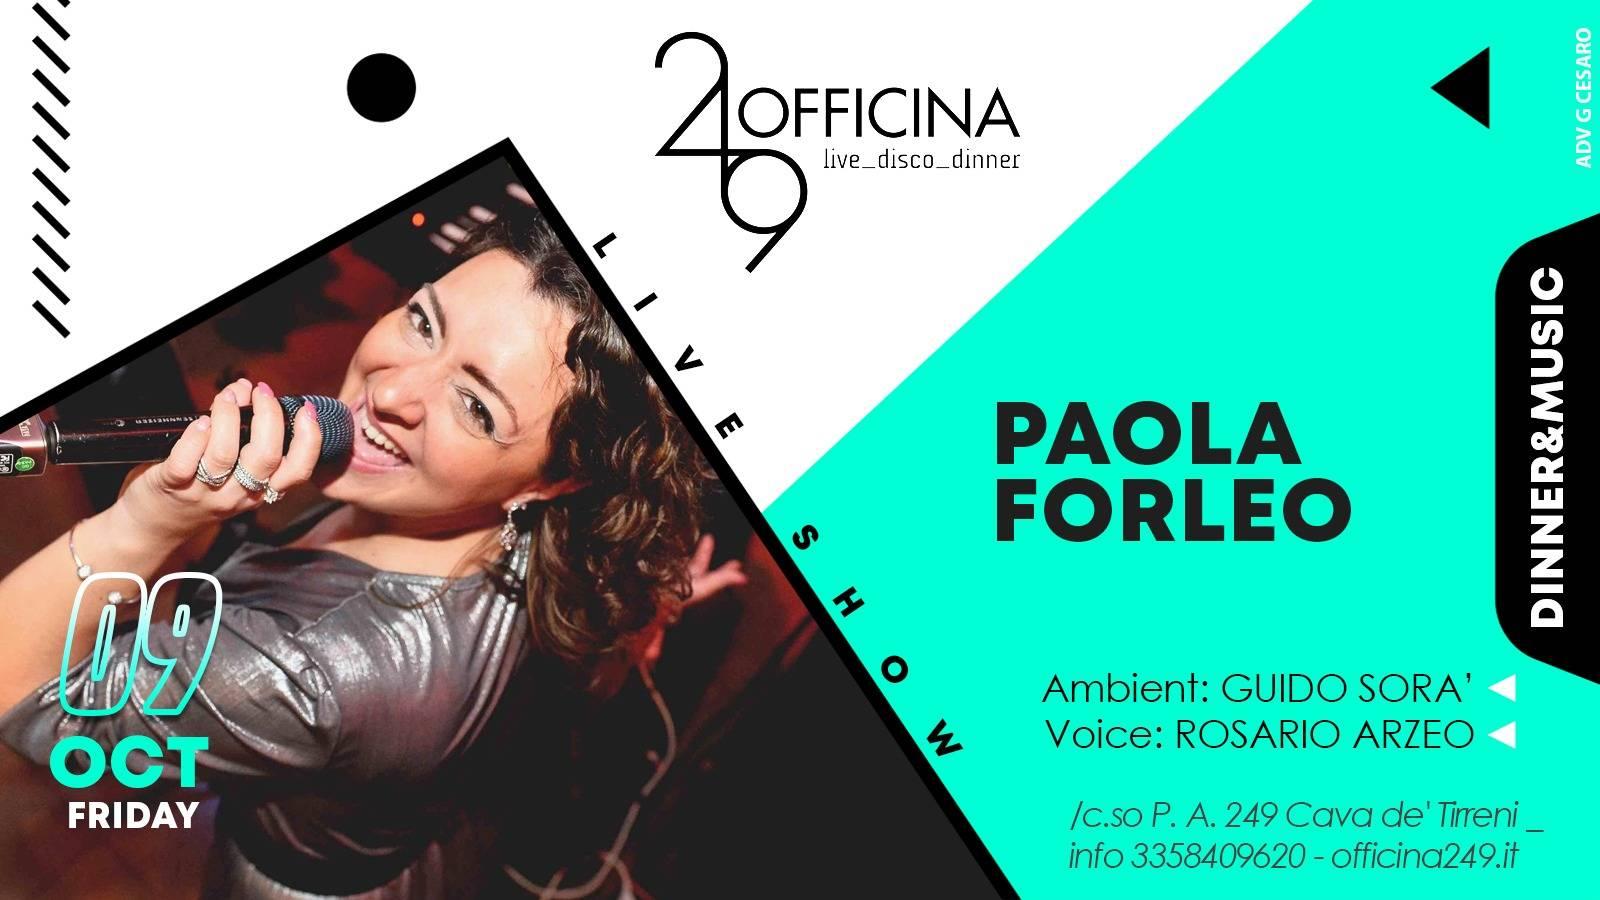 Officina 249 – Venerdì 9 ottobre PAOLA FORLEO